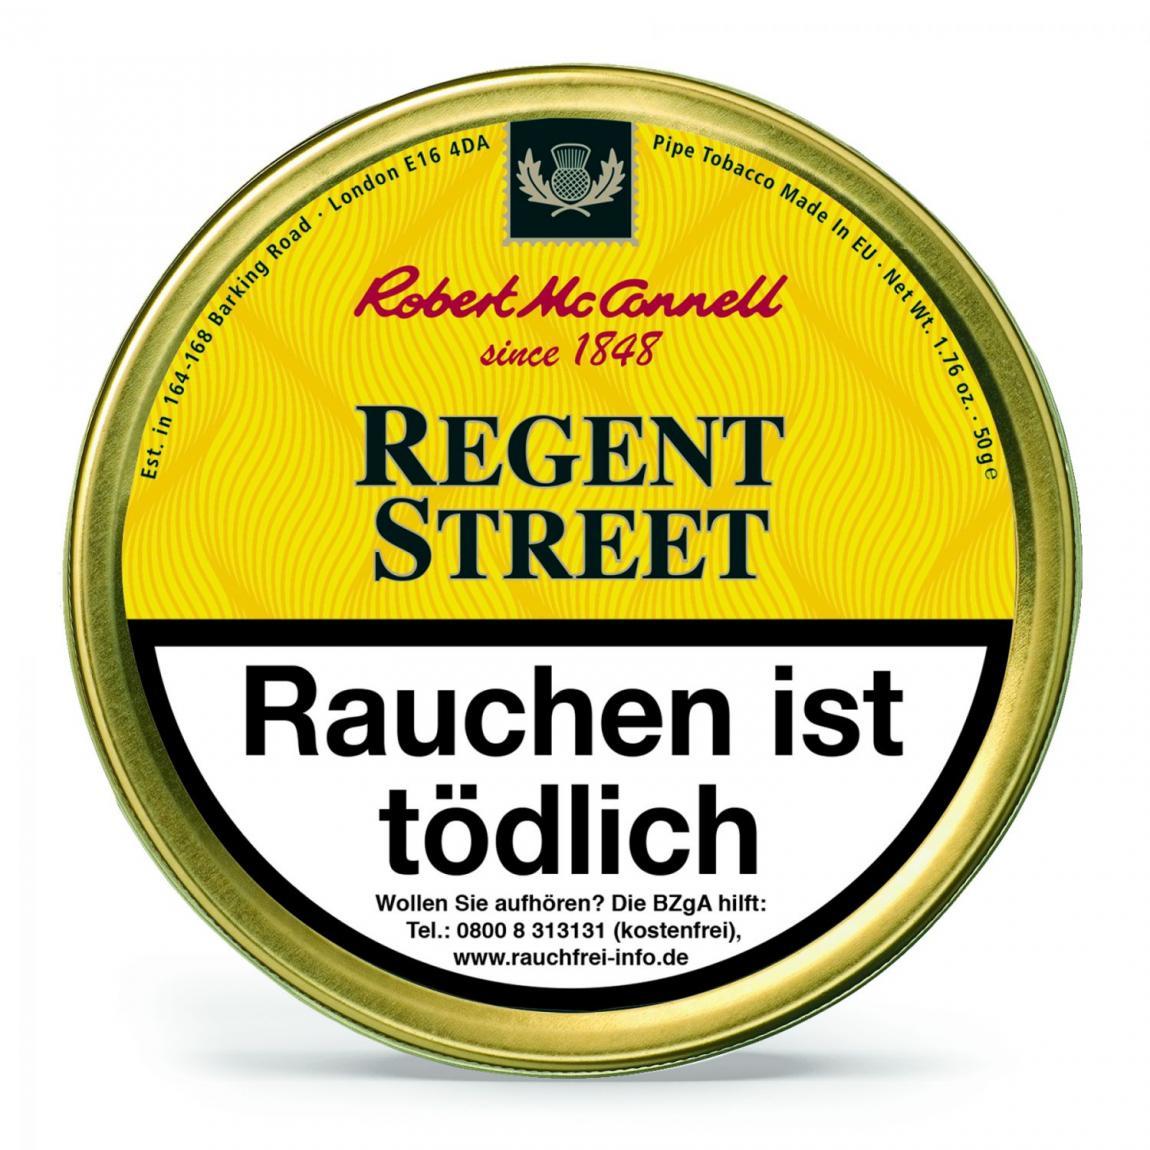 Robert McConnell Heritage »Regent Street« 50g